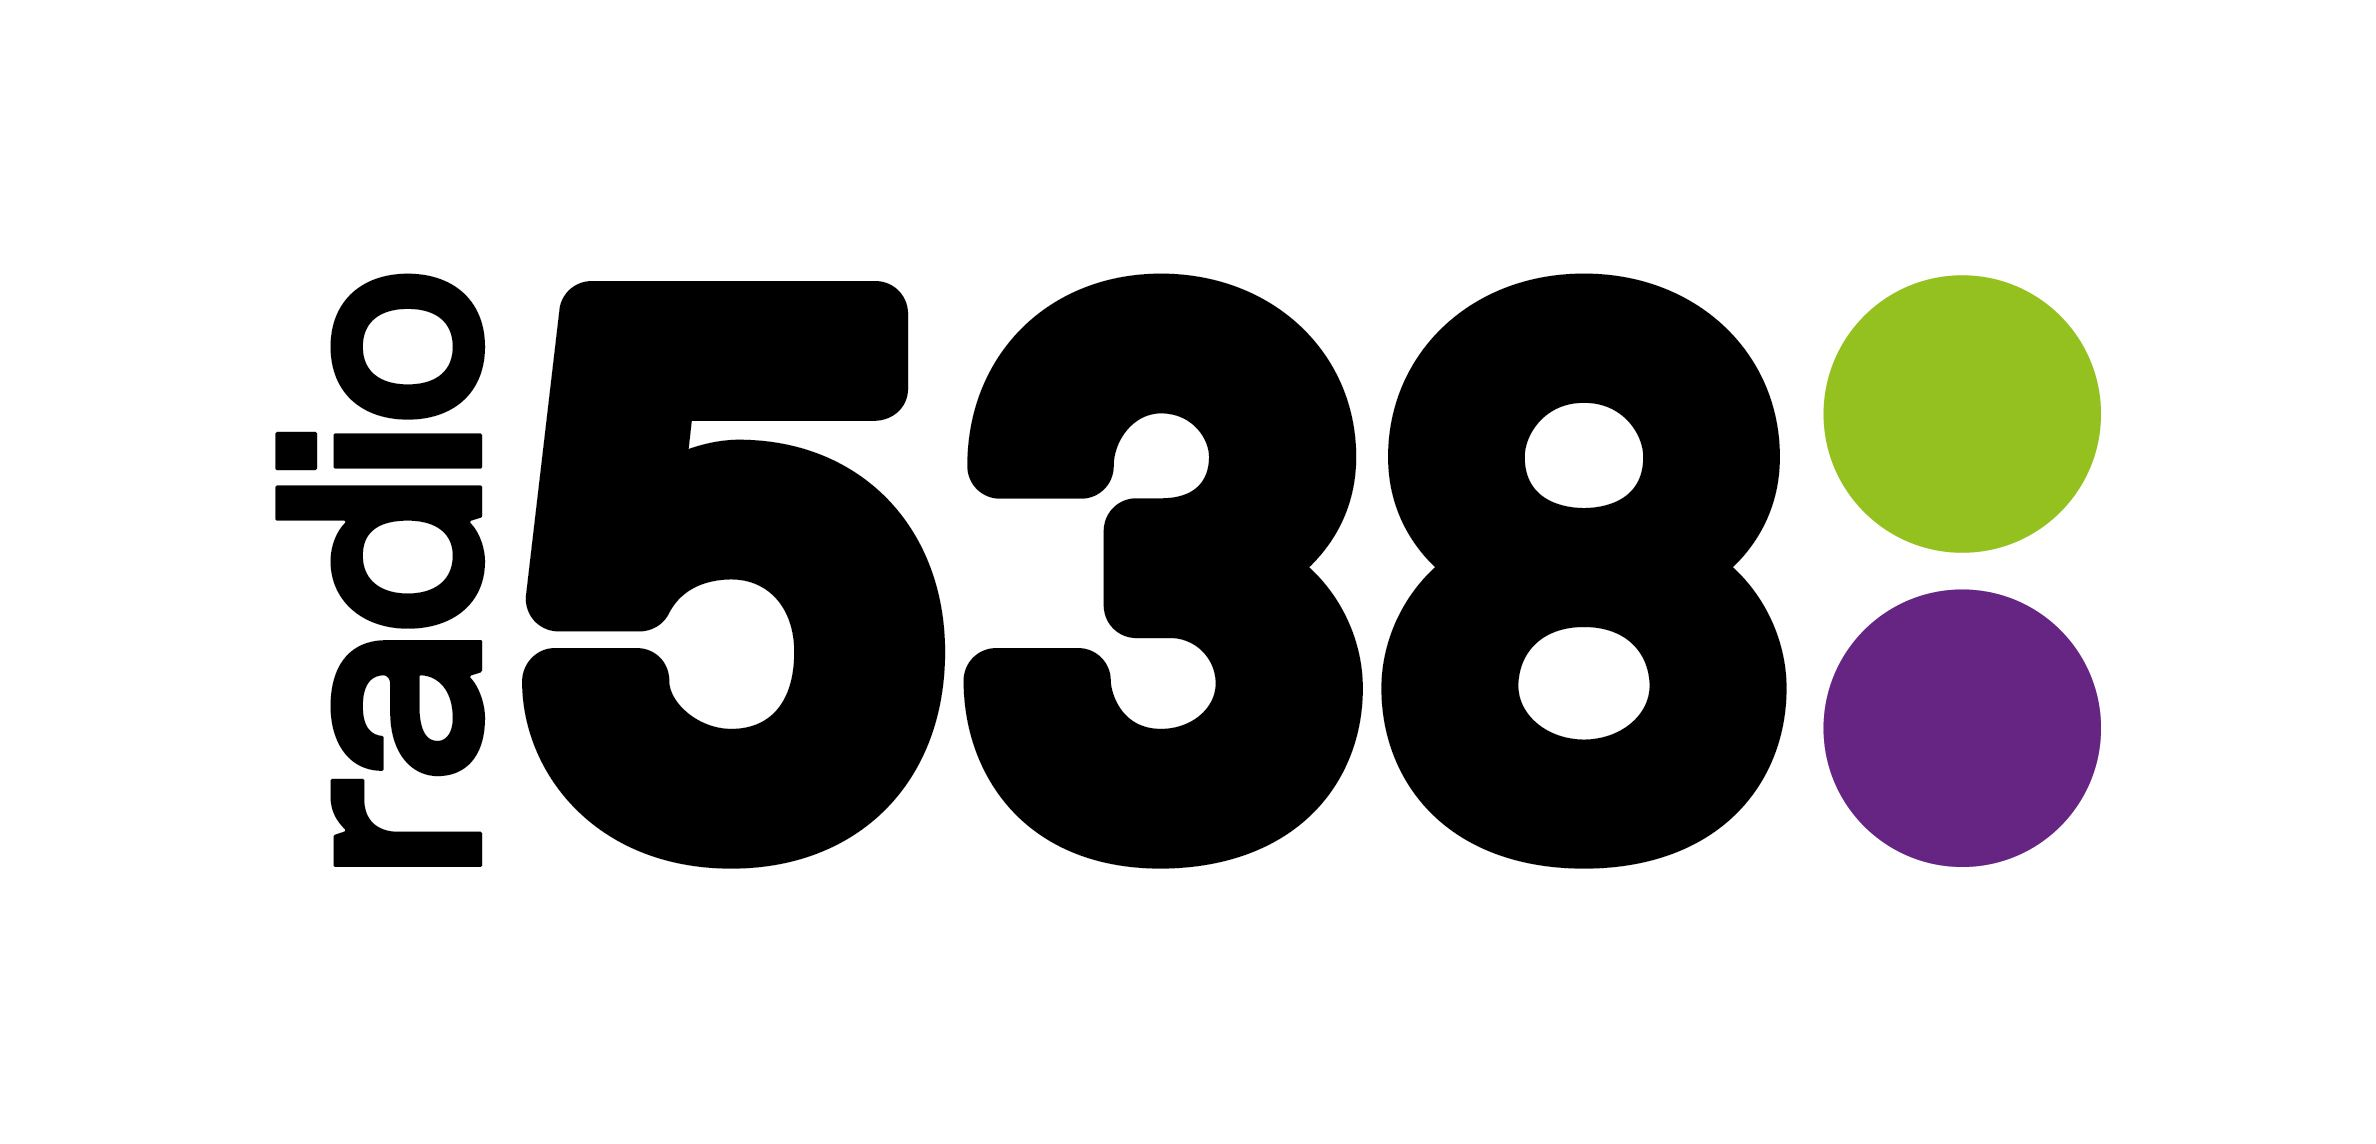 181692 logo%20radio%20538 6ae492 original 1443617890